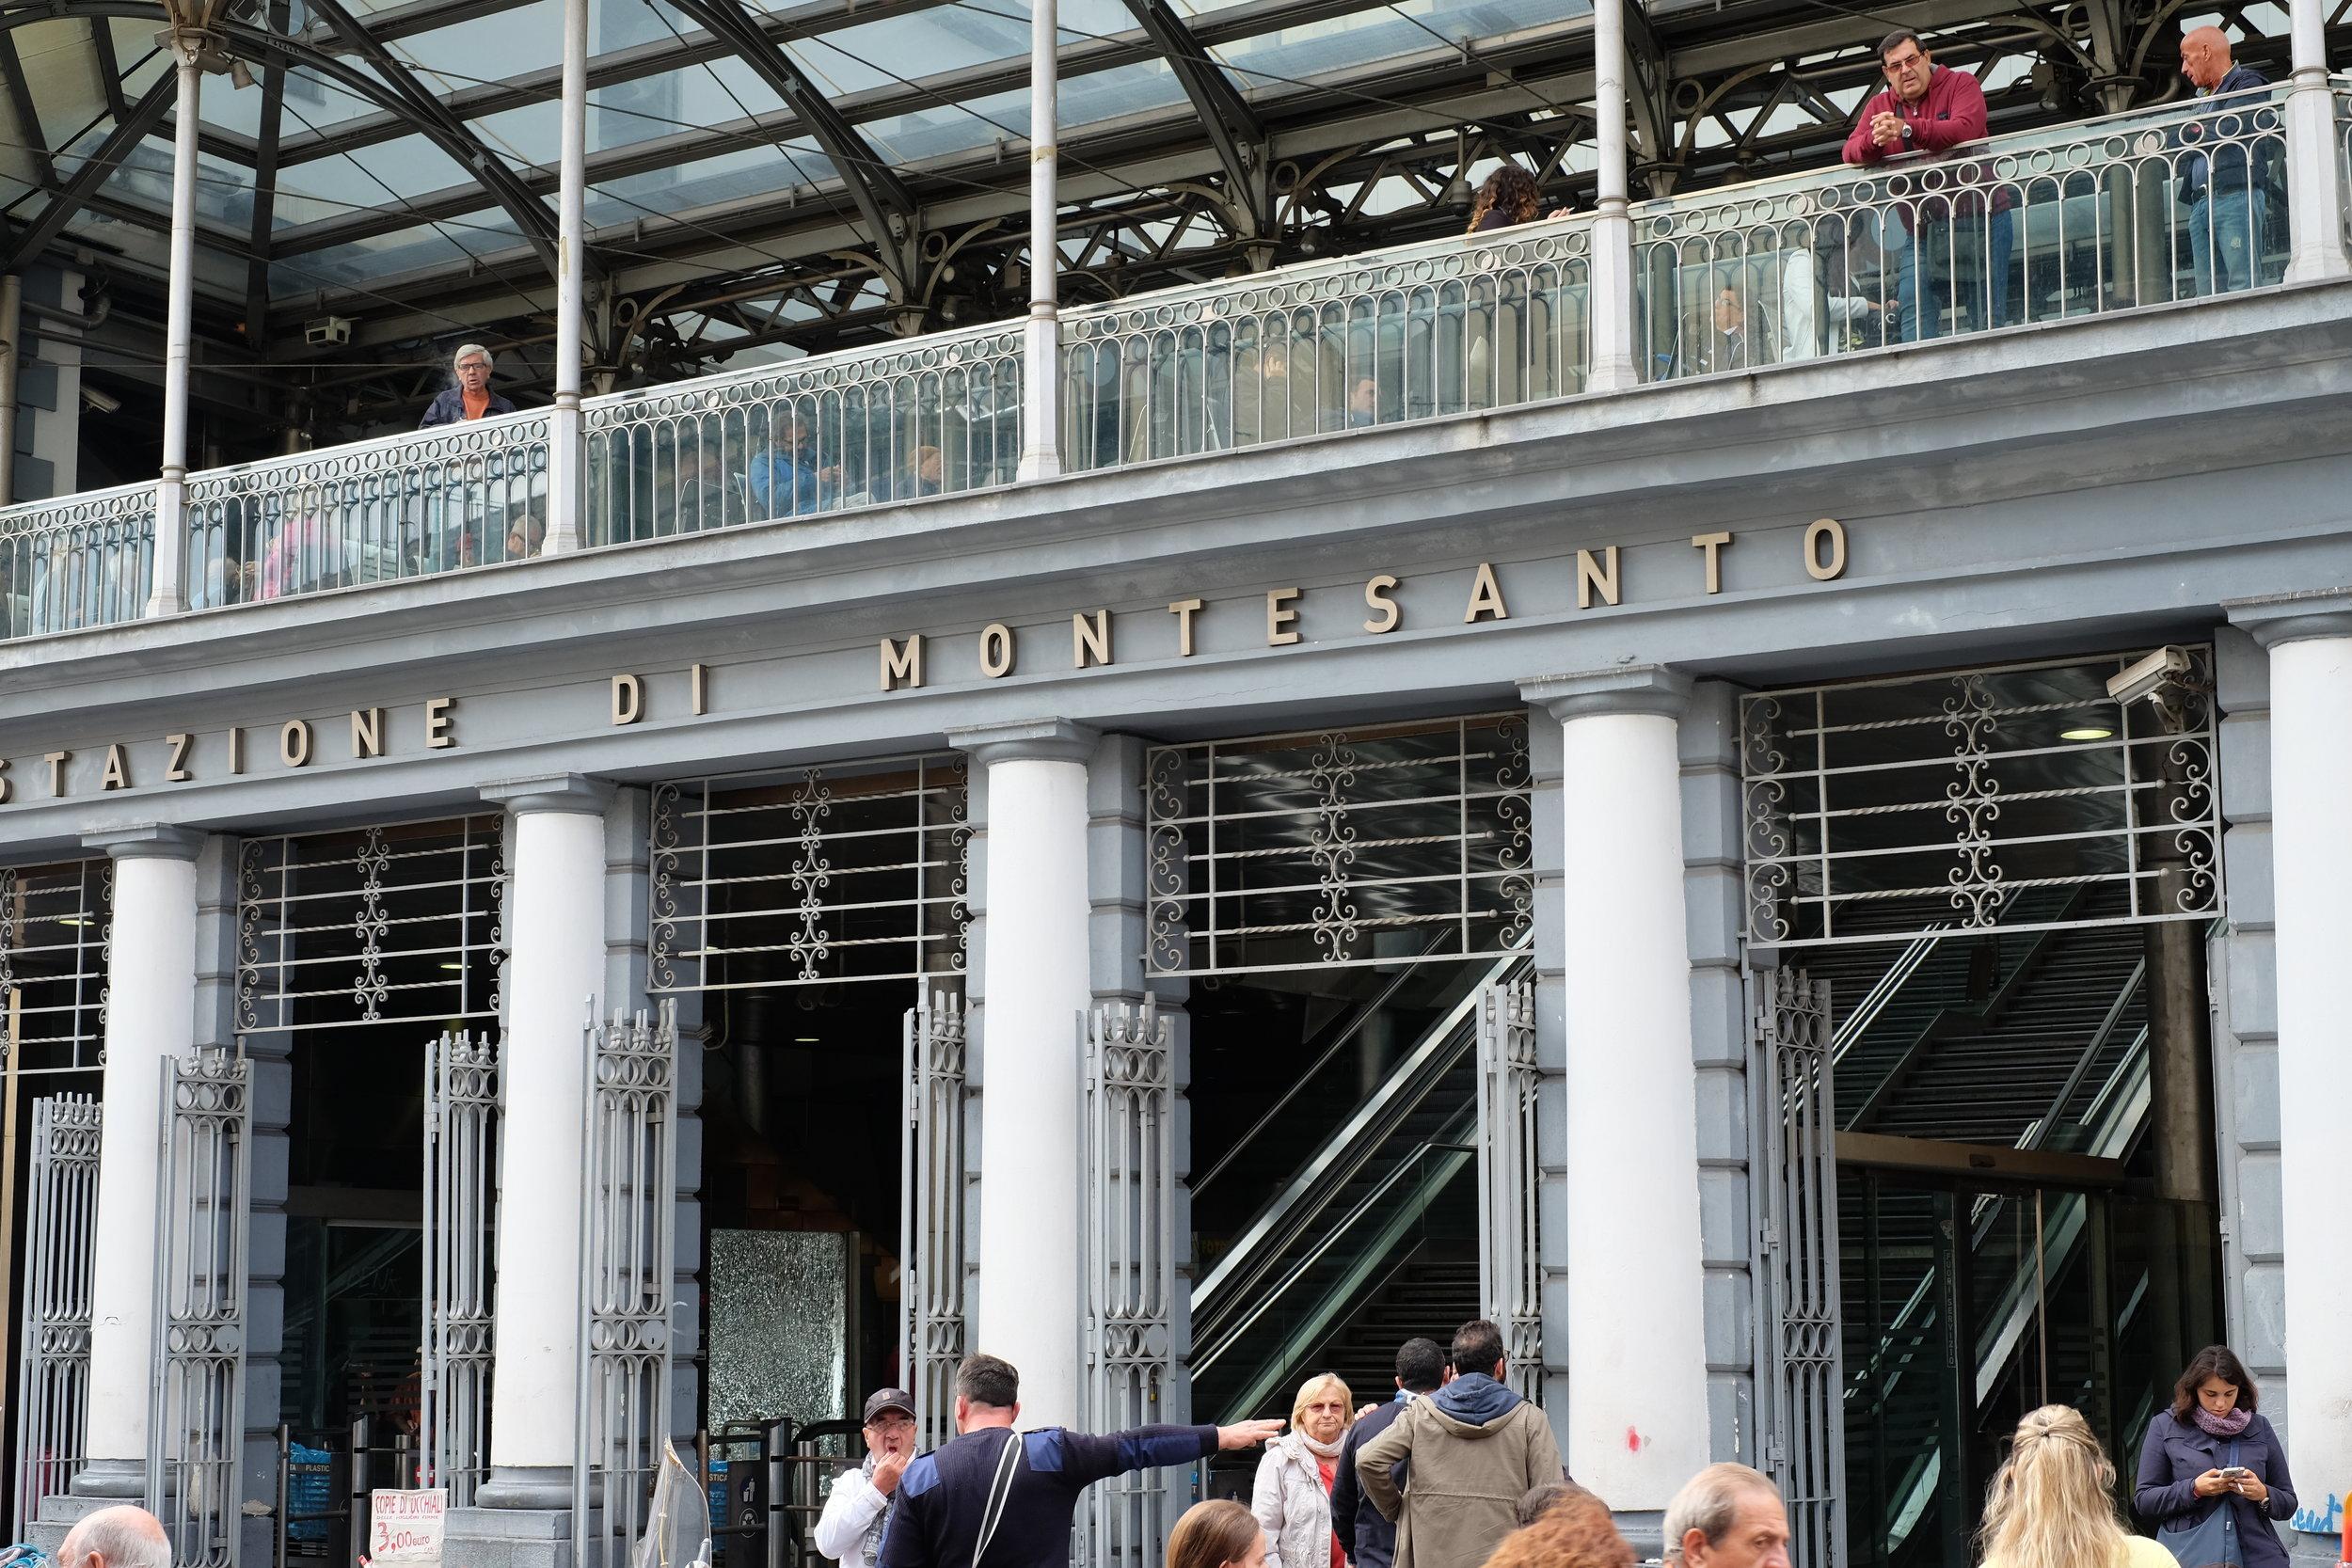 Funicolare of Montesanto.